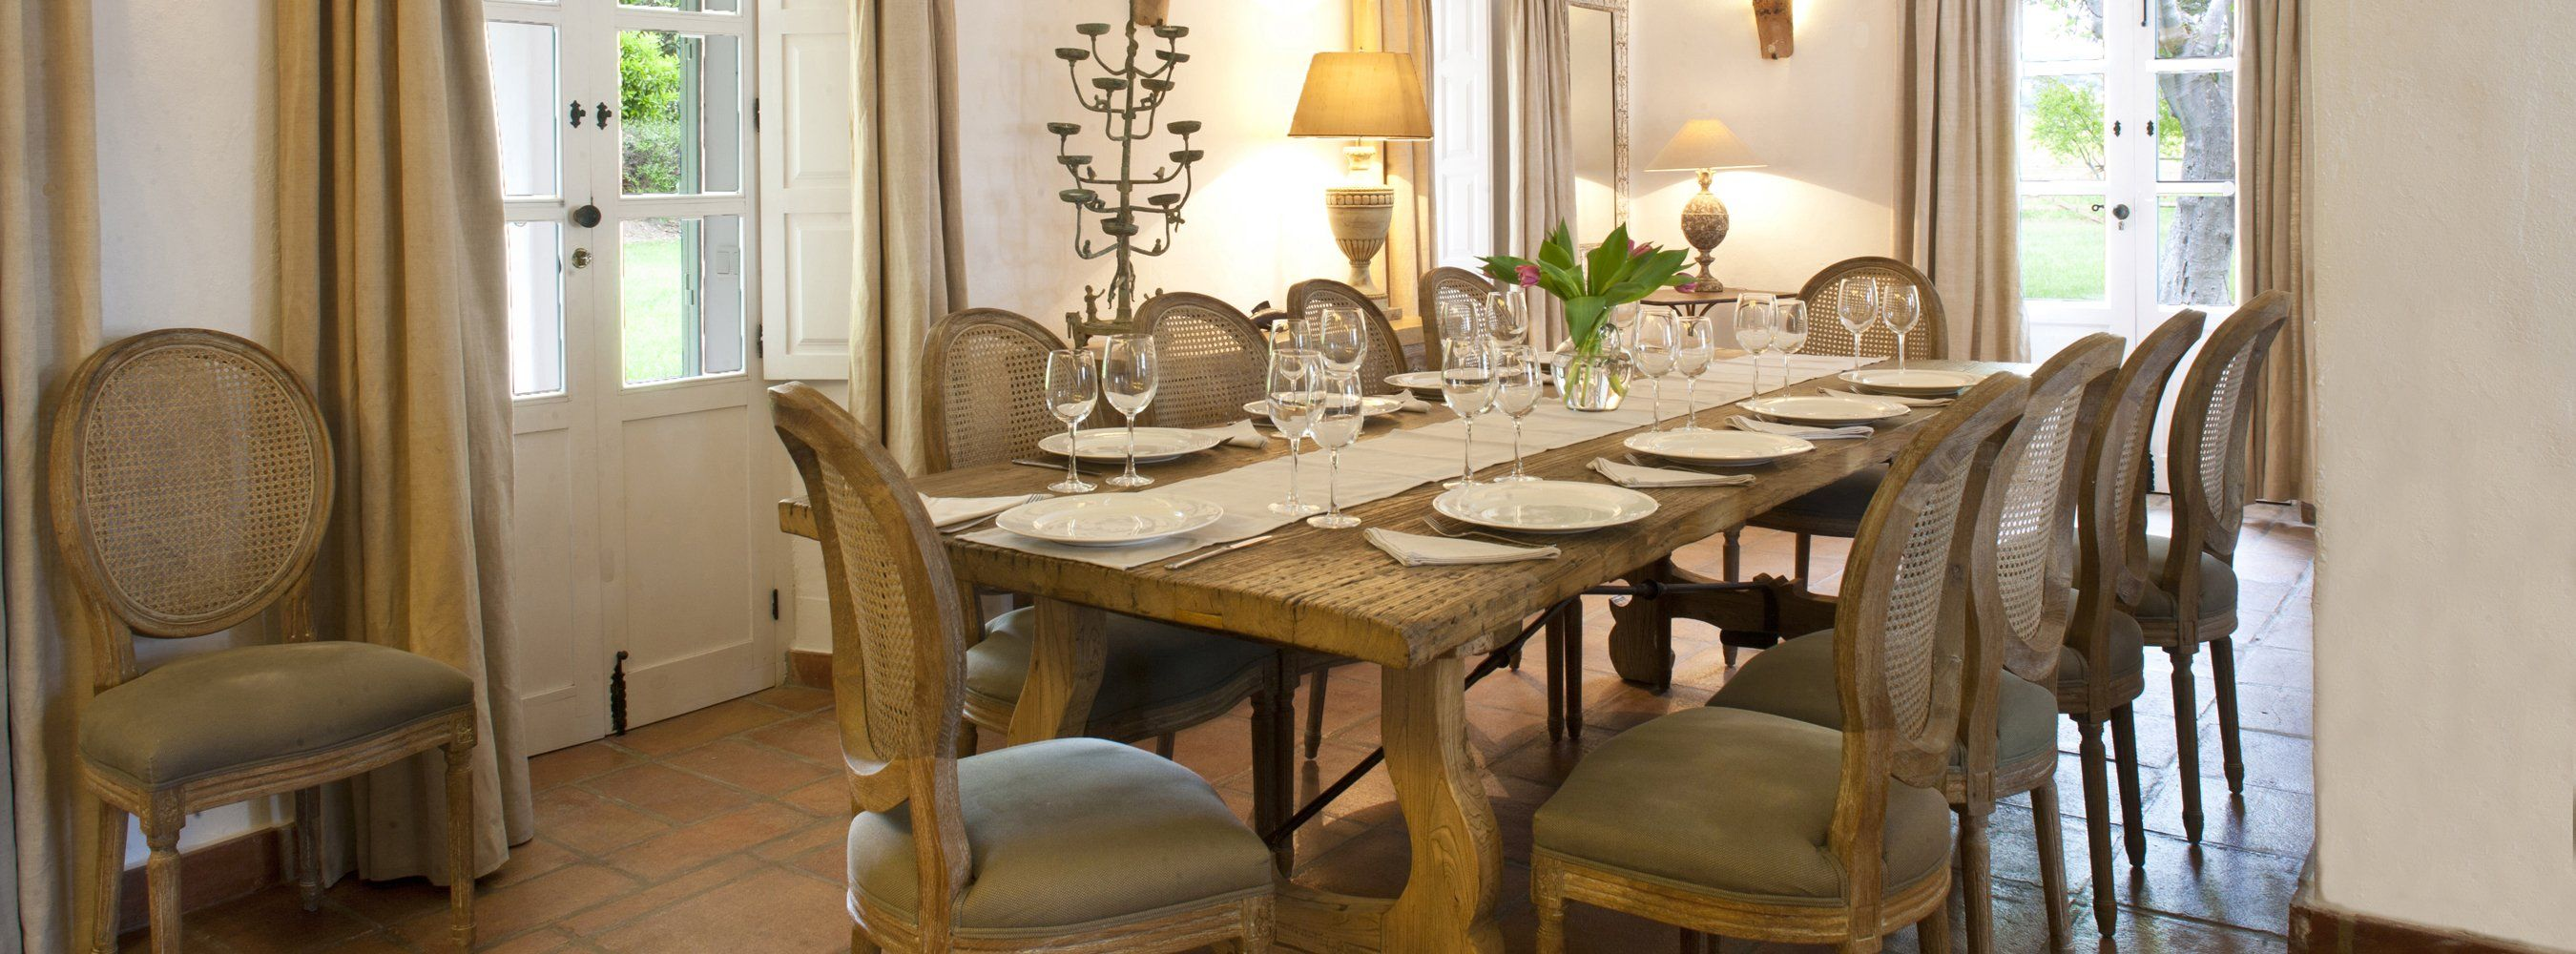 luxury dining experience in ronda villa